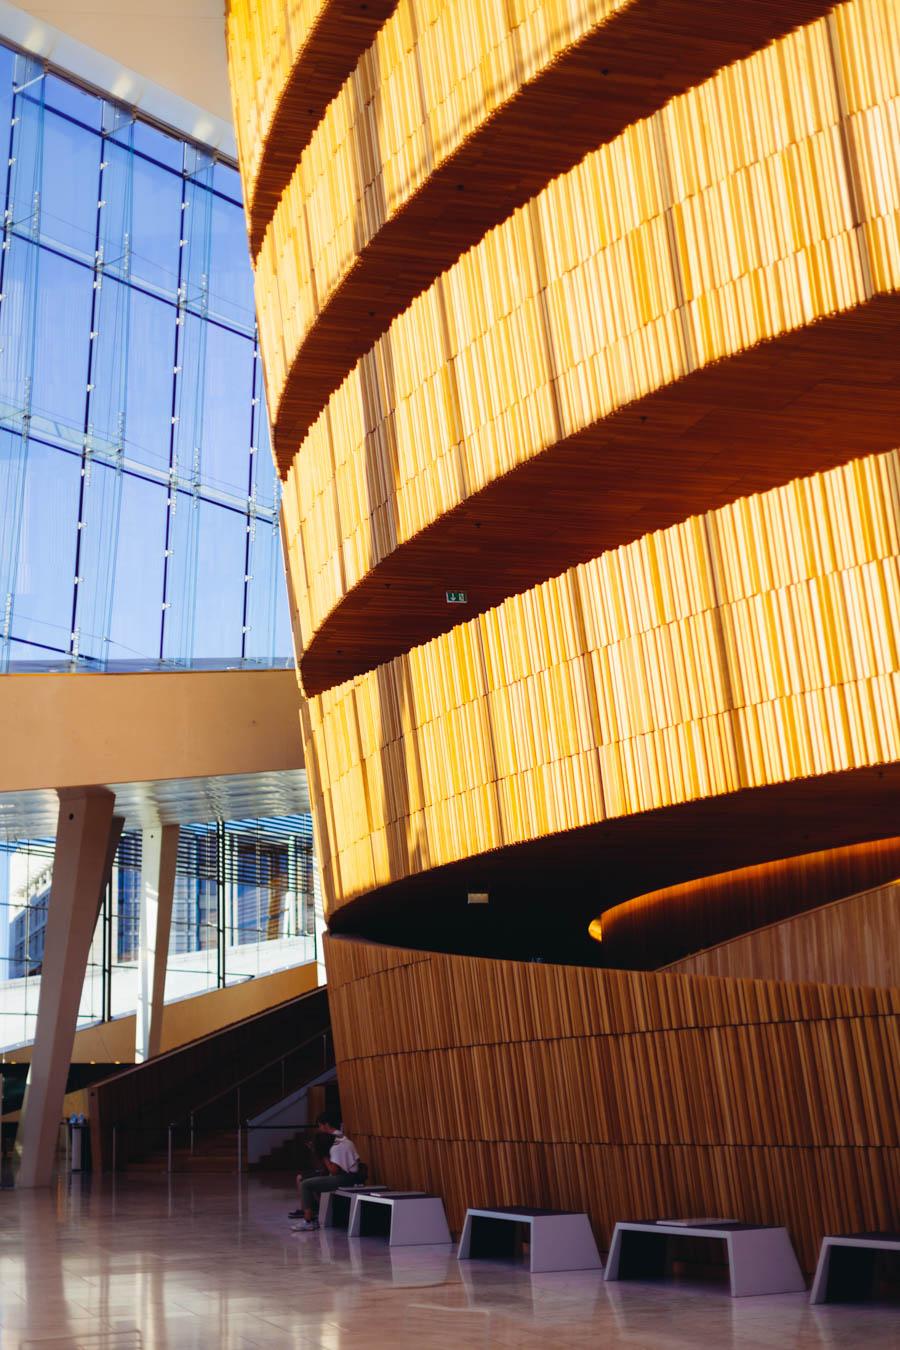 Le-Sycomore_Oslo-Opera-House